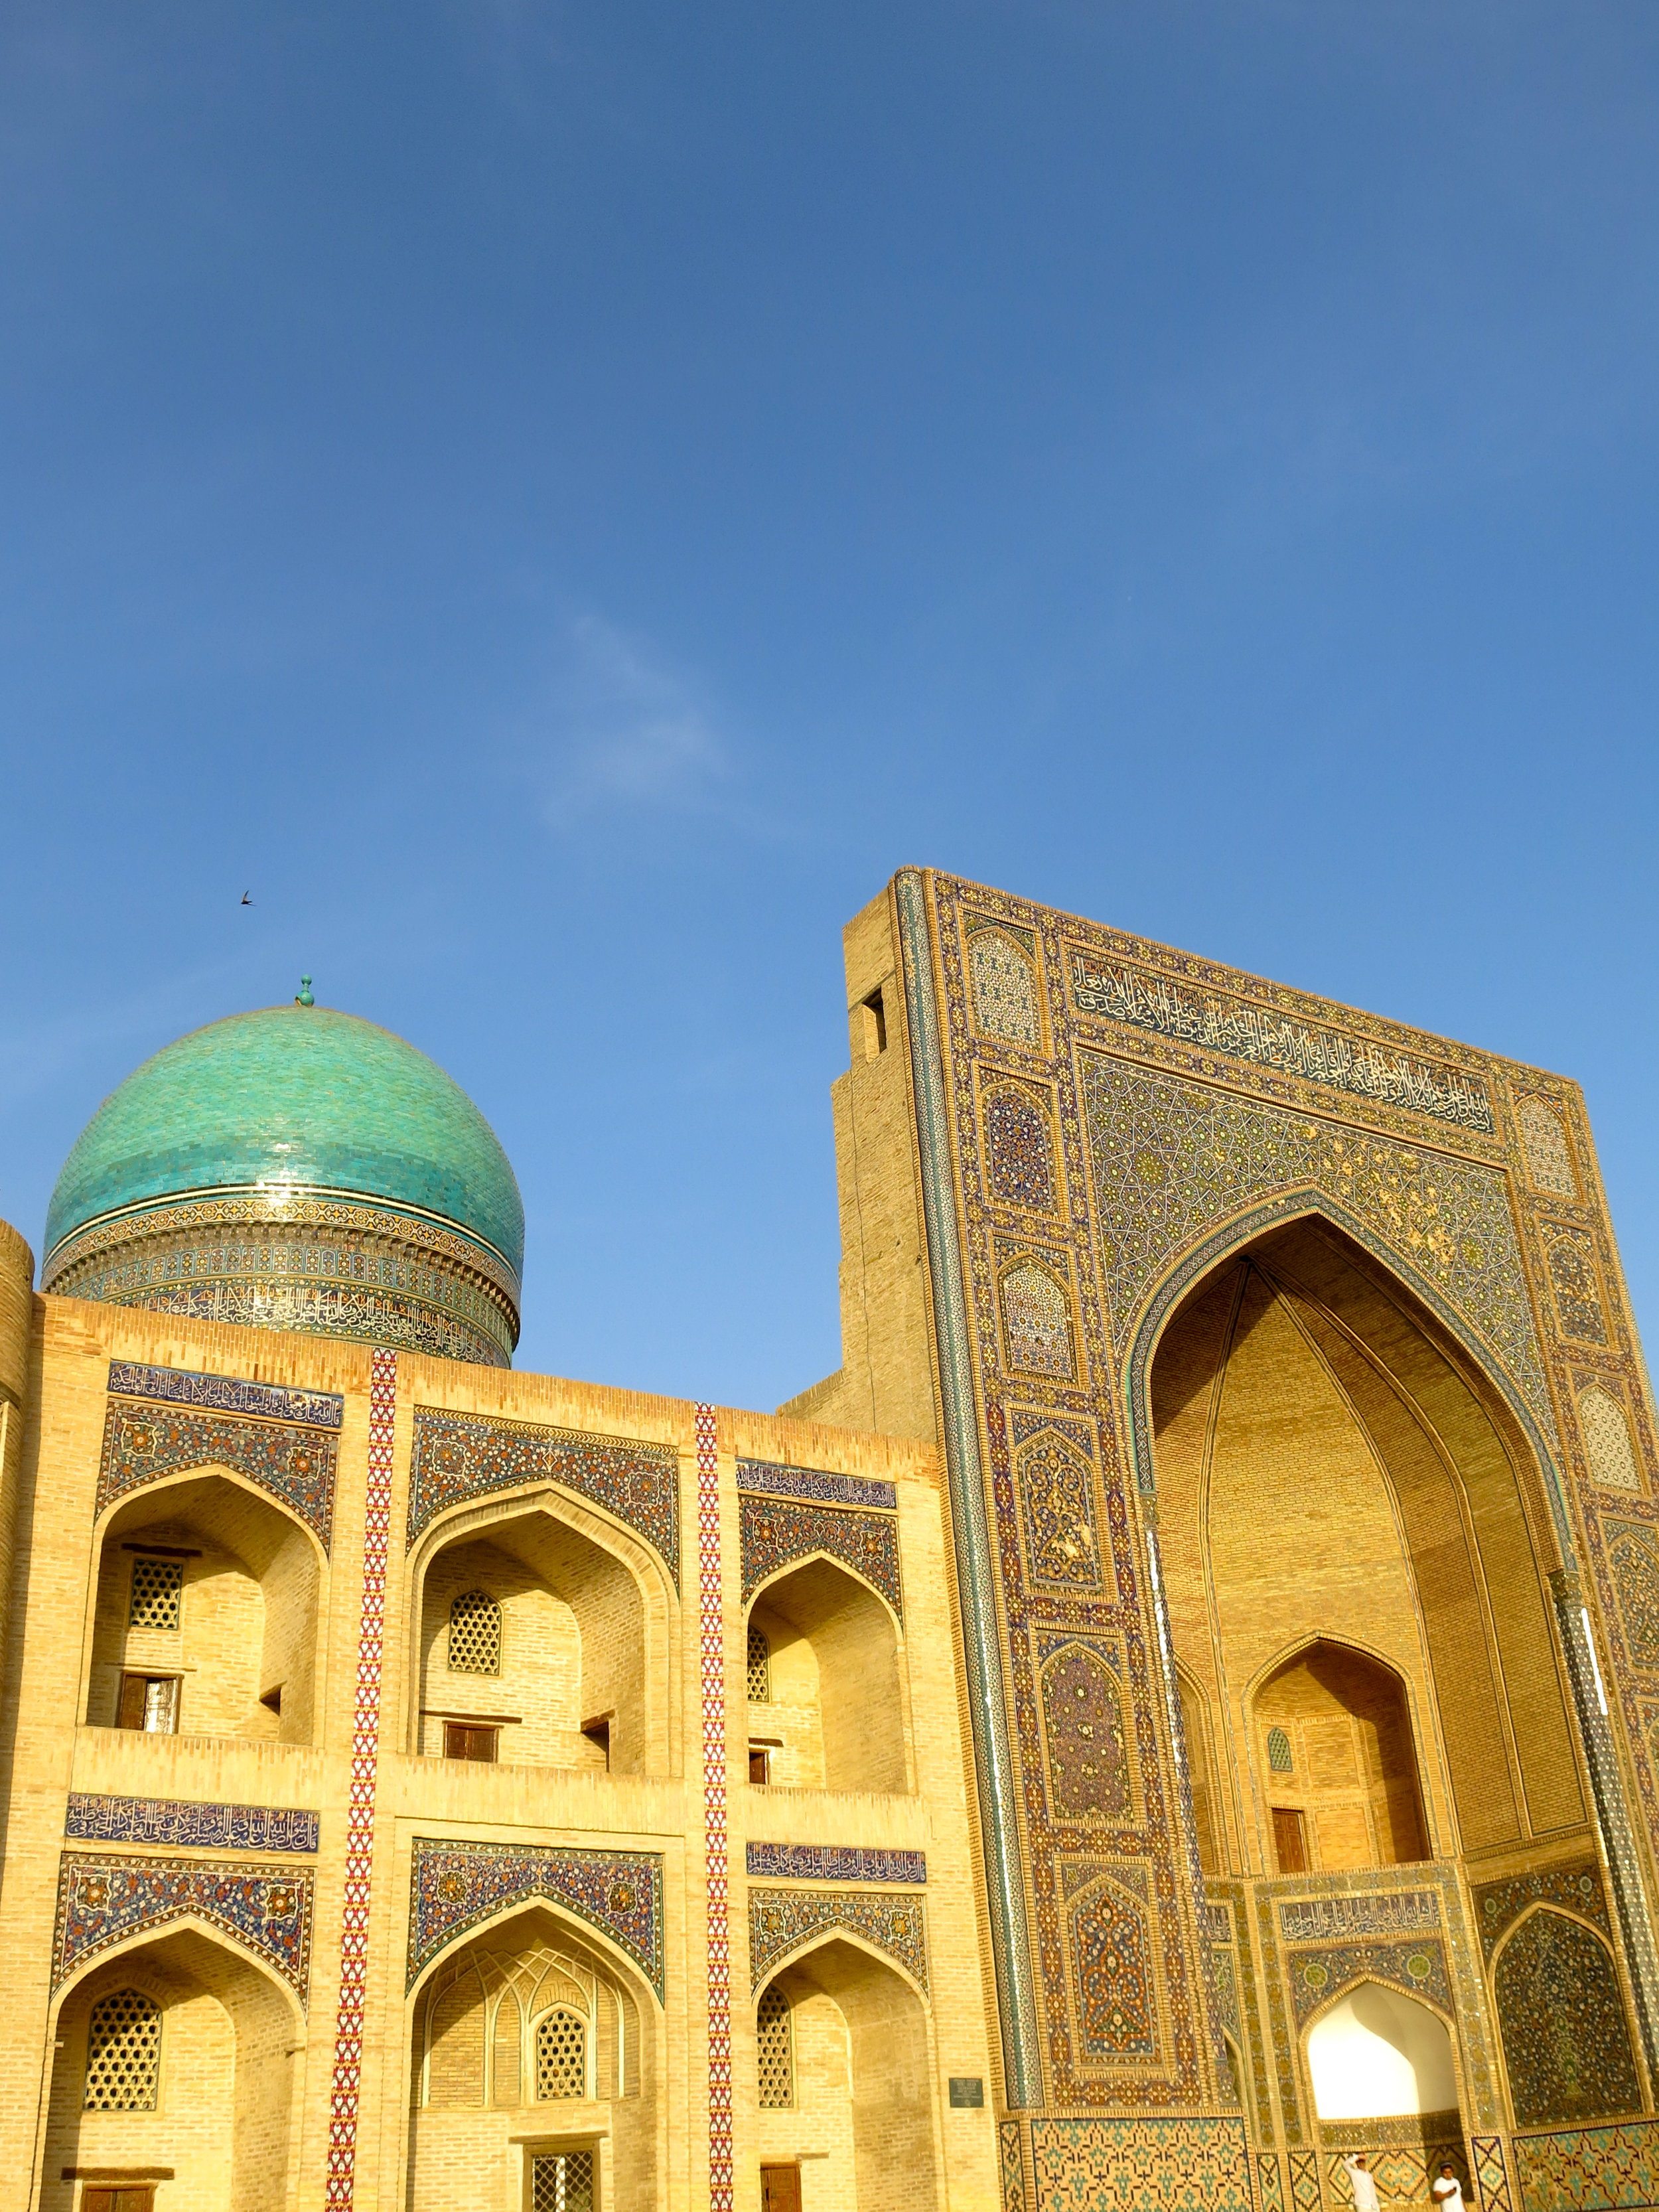 The Mir-i-Arab madrasa is still serving as a theological school